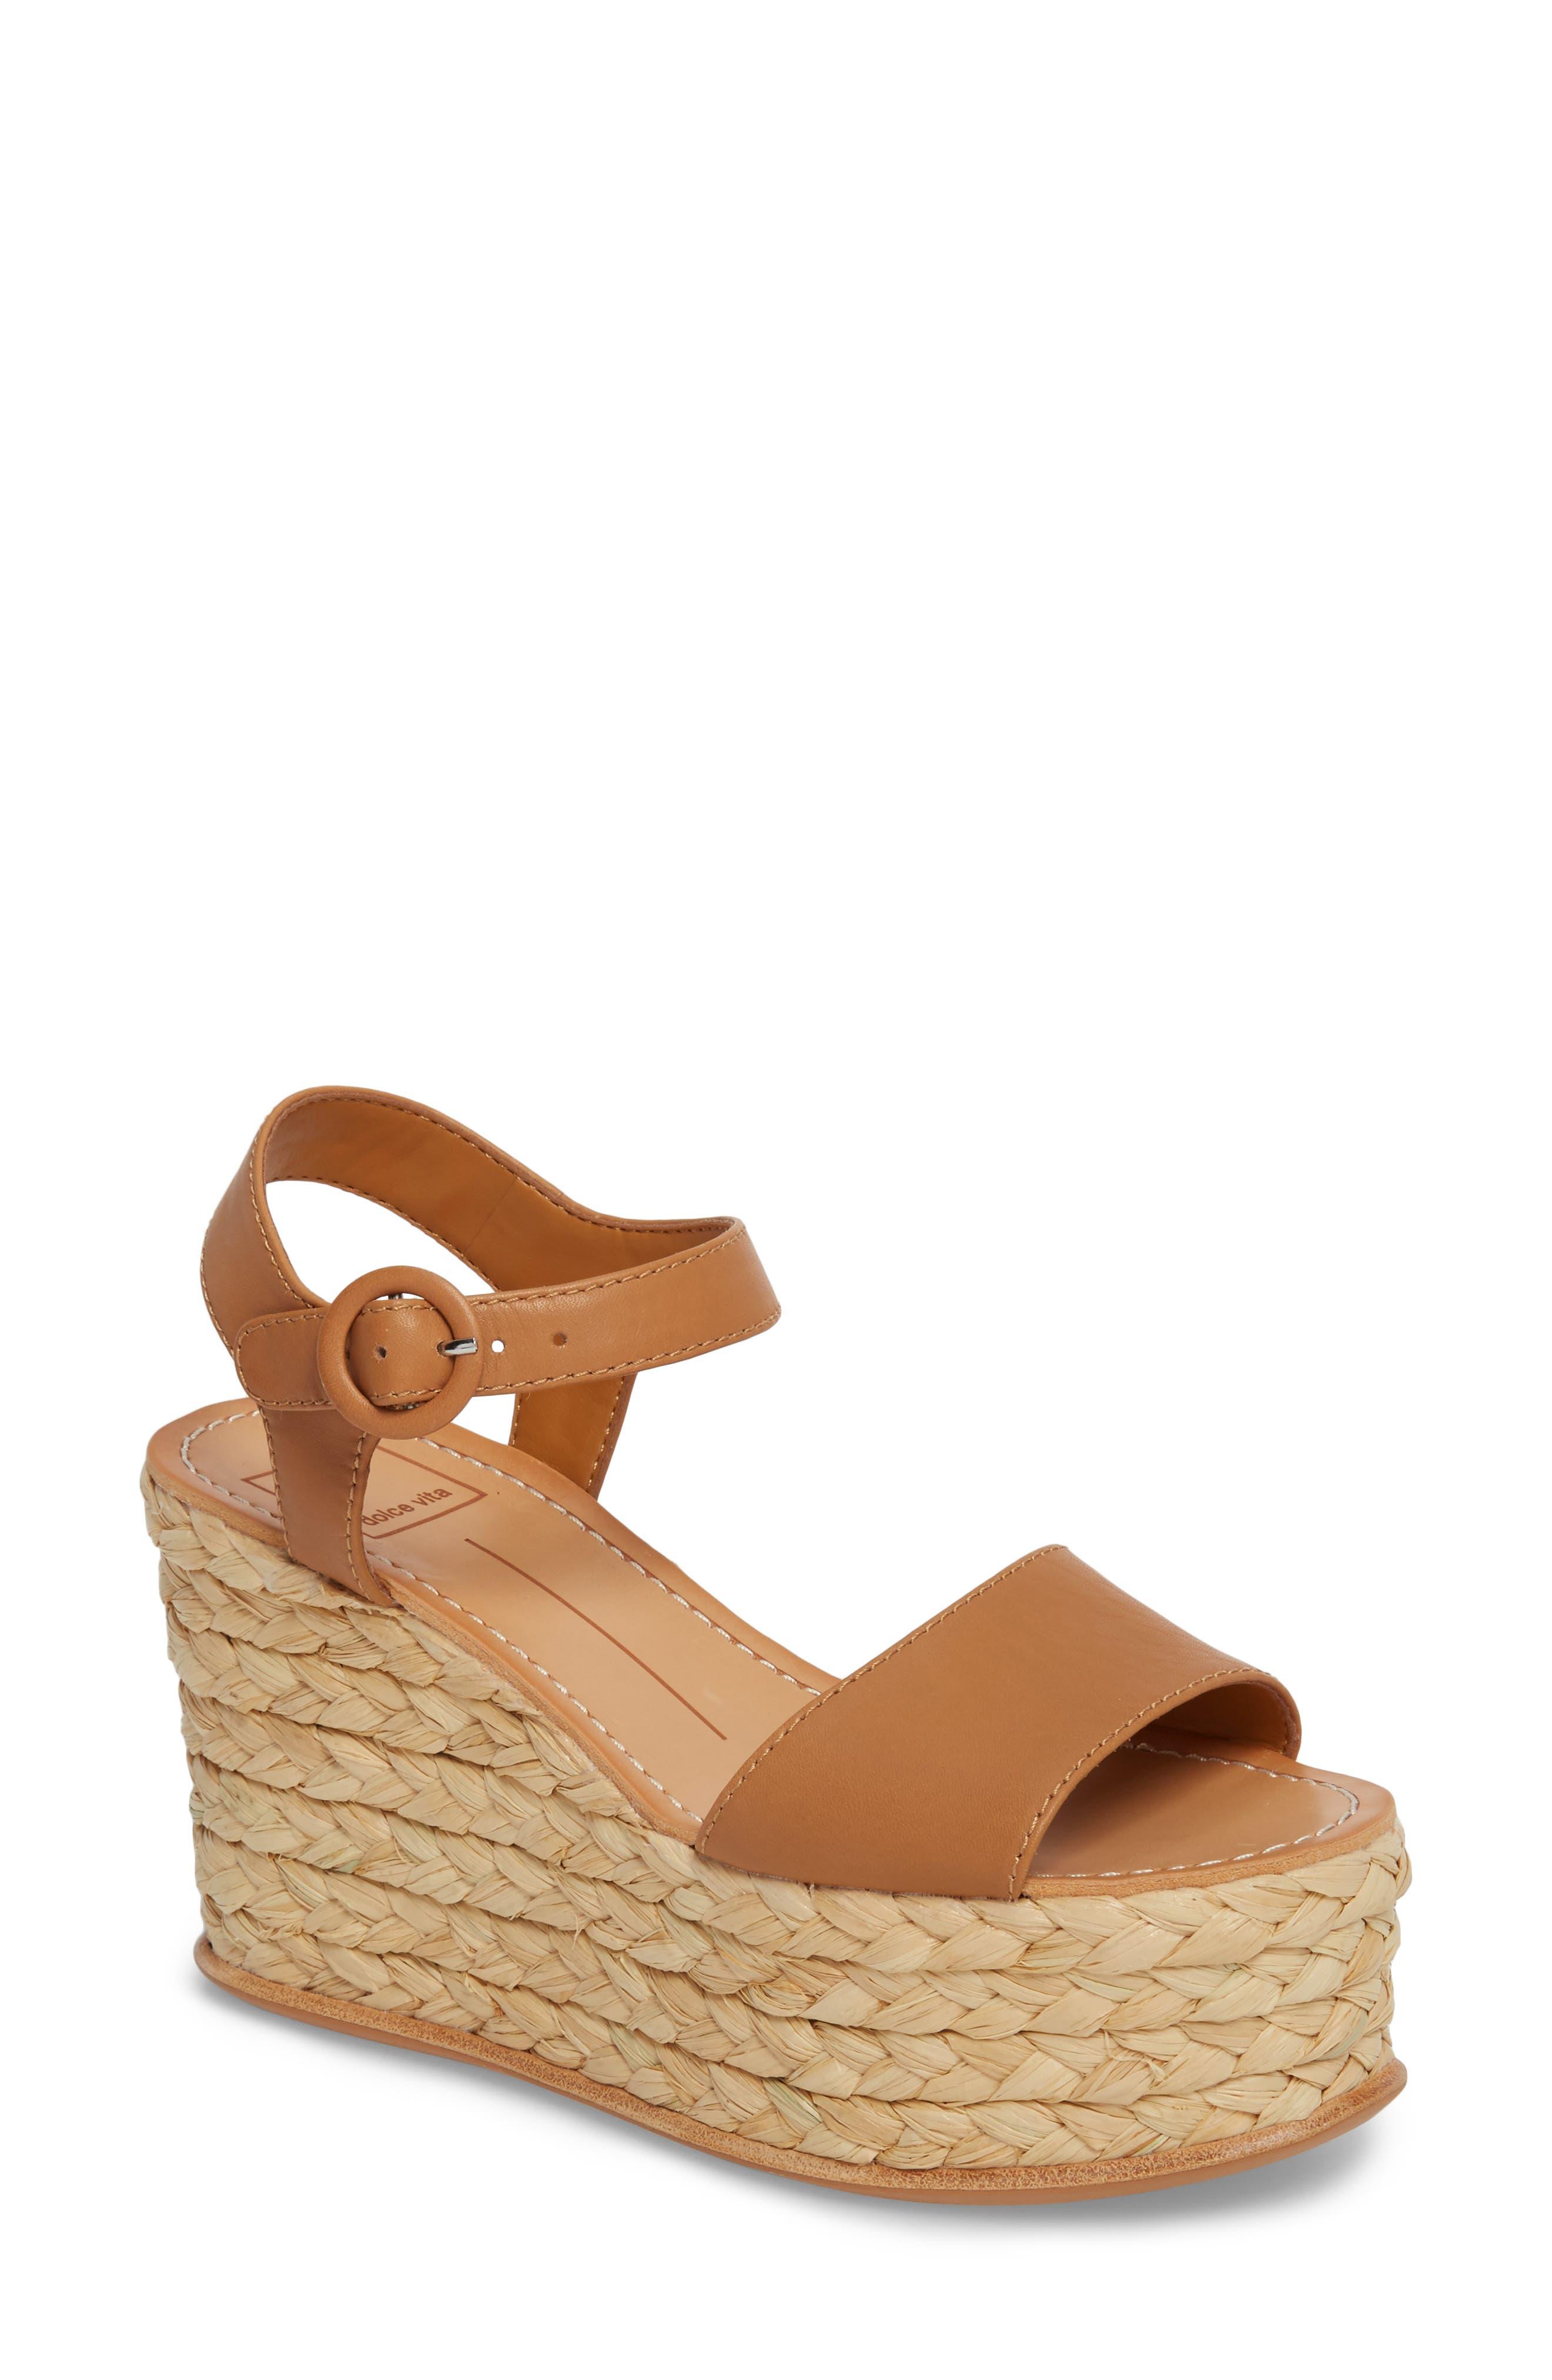 Dane Espadrille Wedge Sandal,                         Main,                         color, 200